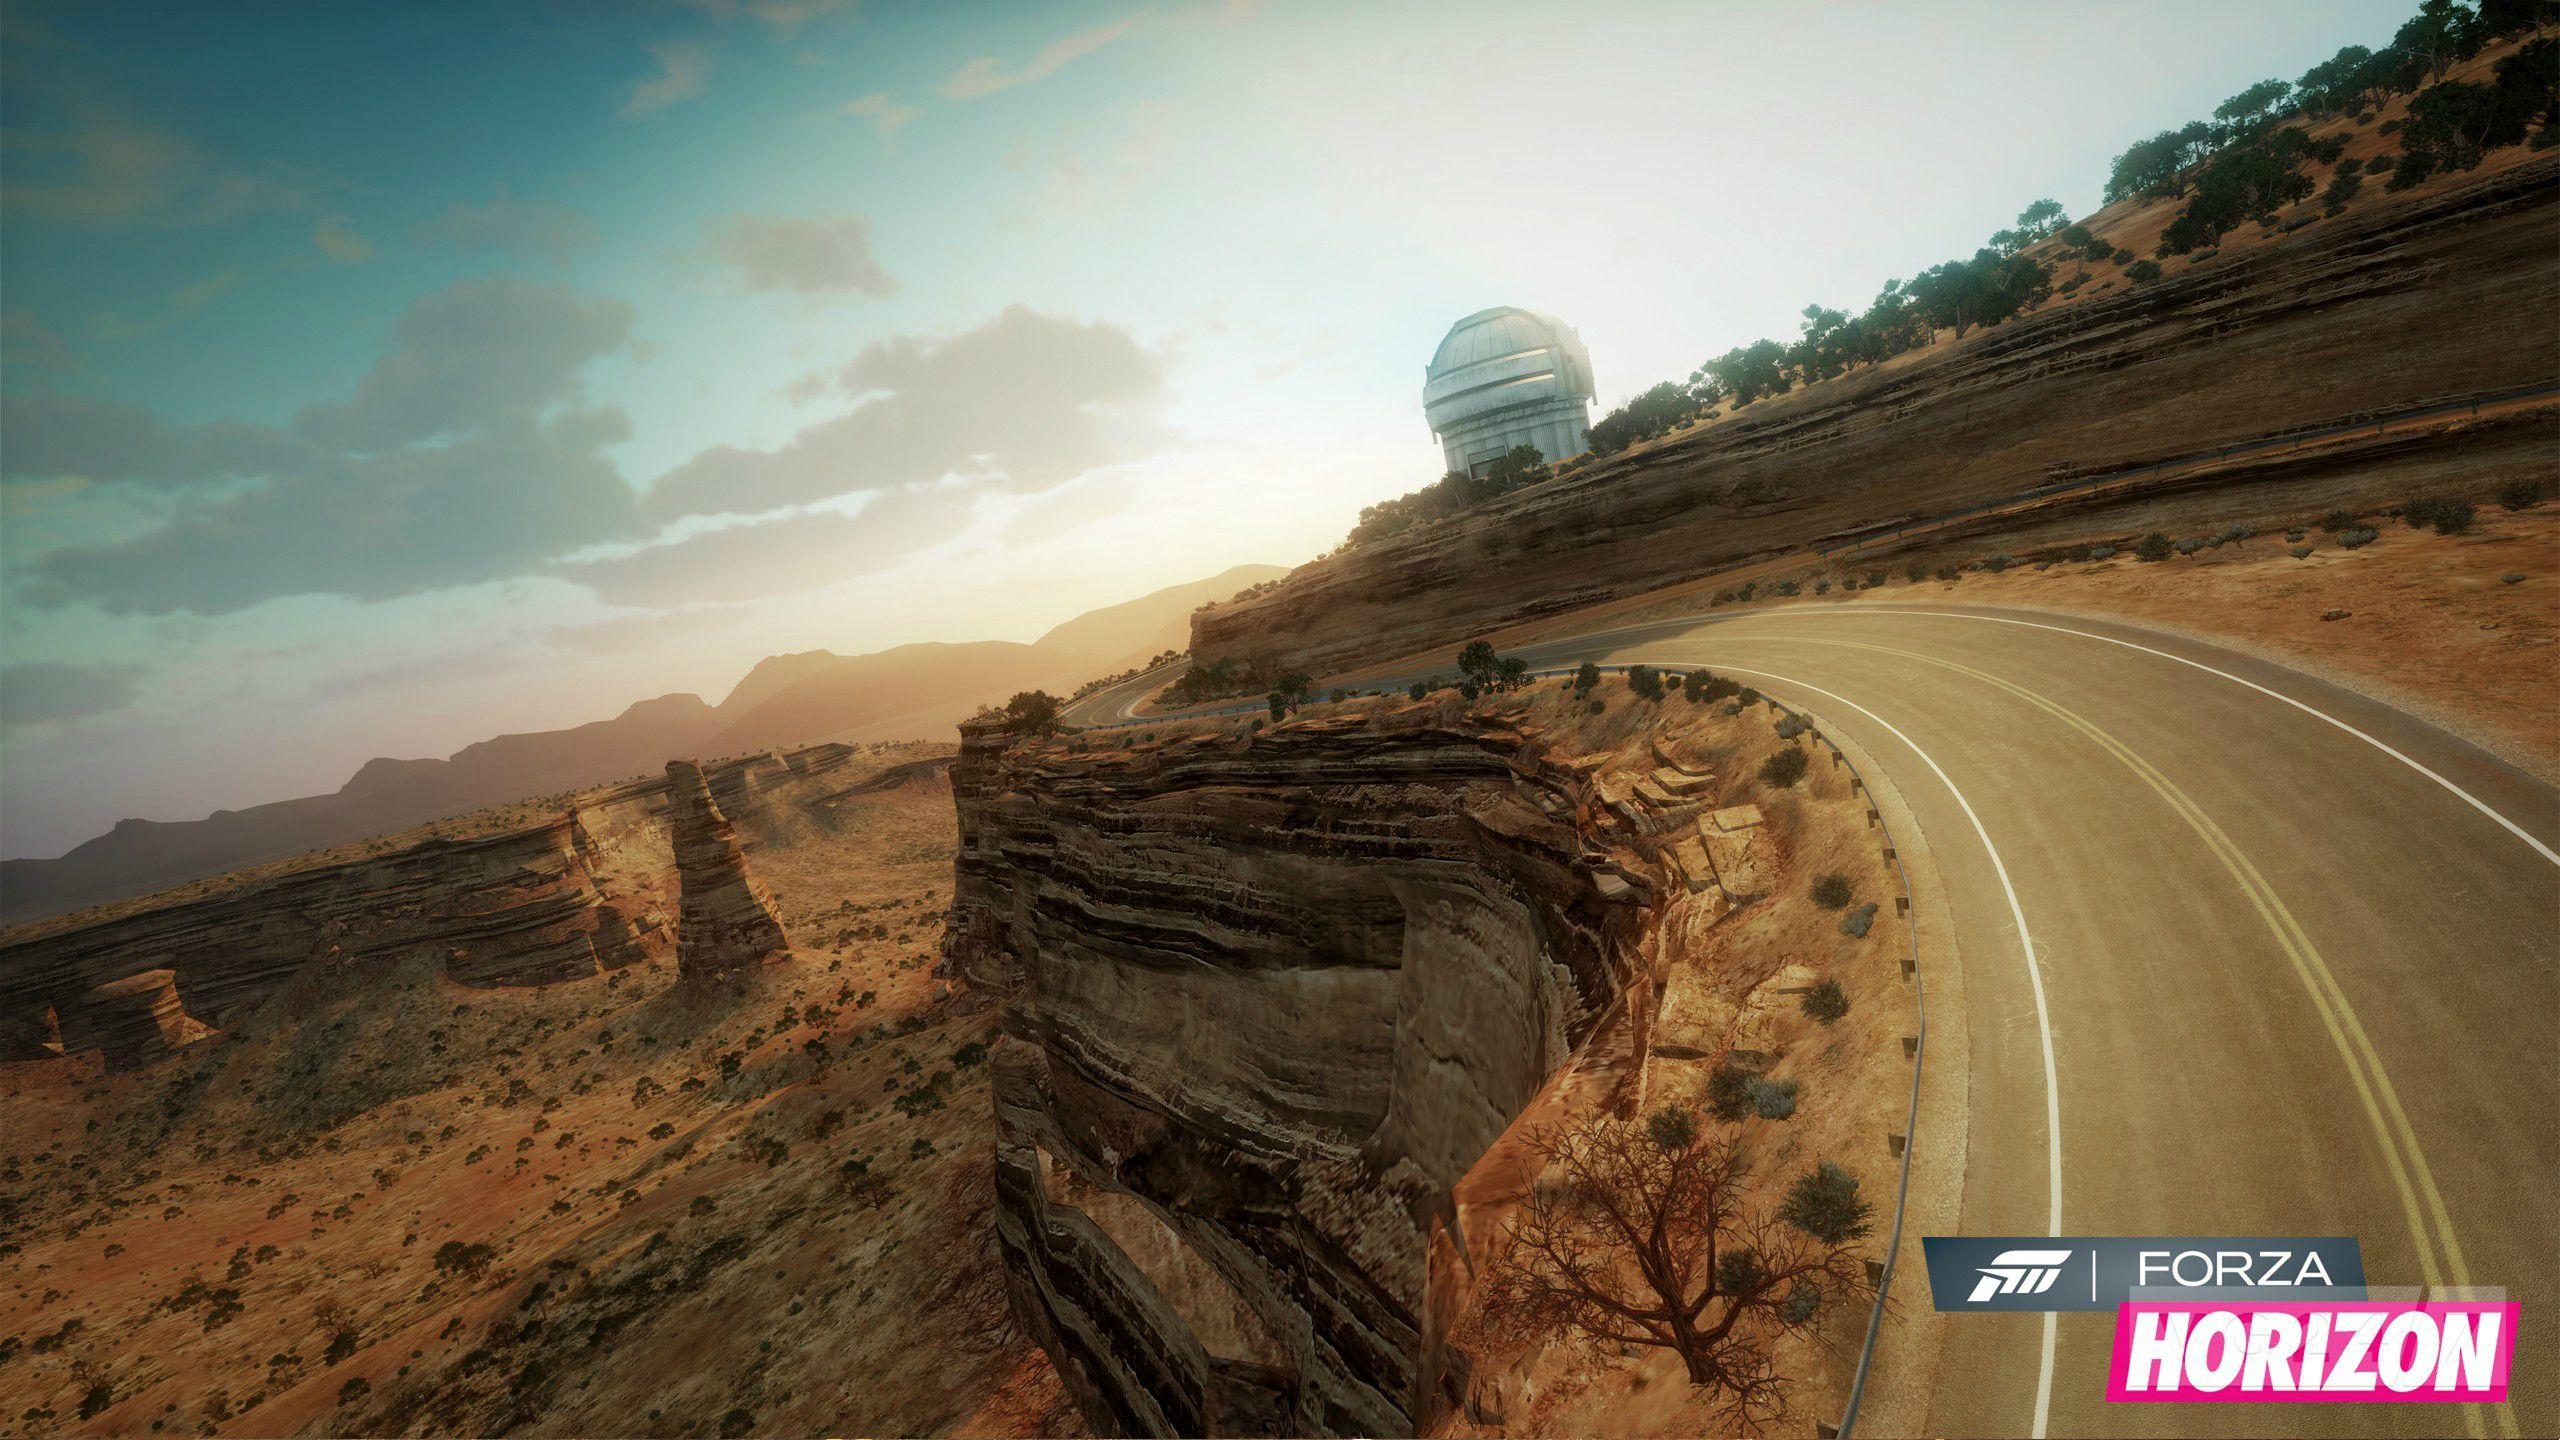 of Forza Horizon You are downloading Forza Horizon wallpaper 6 2560x1440